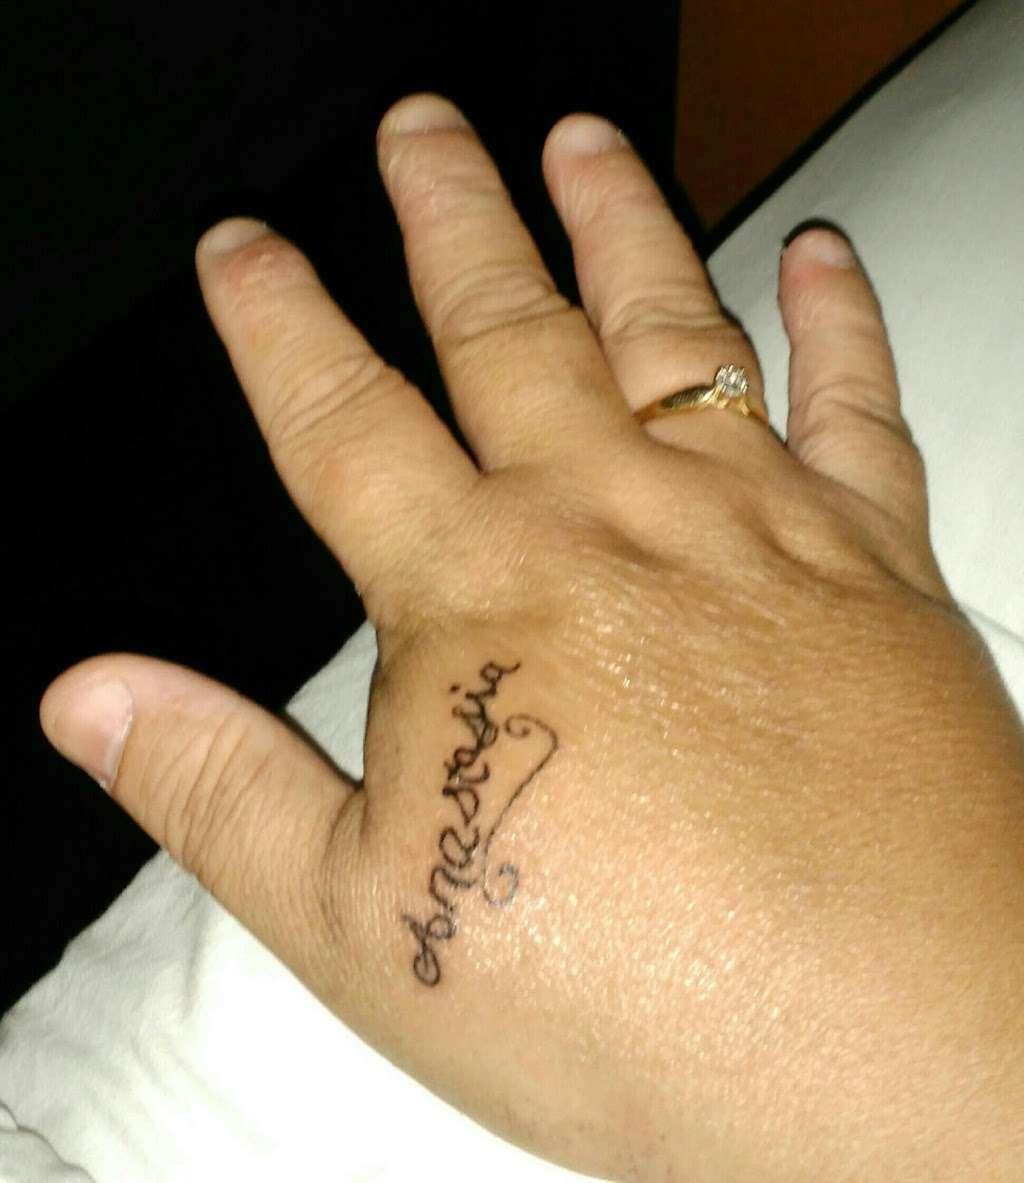 Tattoo Heaven - store  | Photo 2 of 9 | Address: 1889 Webster Ave, Bronx, NY 10457, USA | Phone: (347) 759-8614